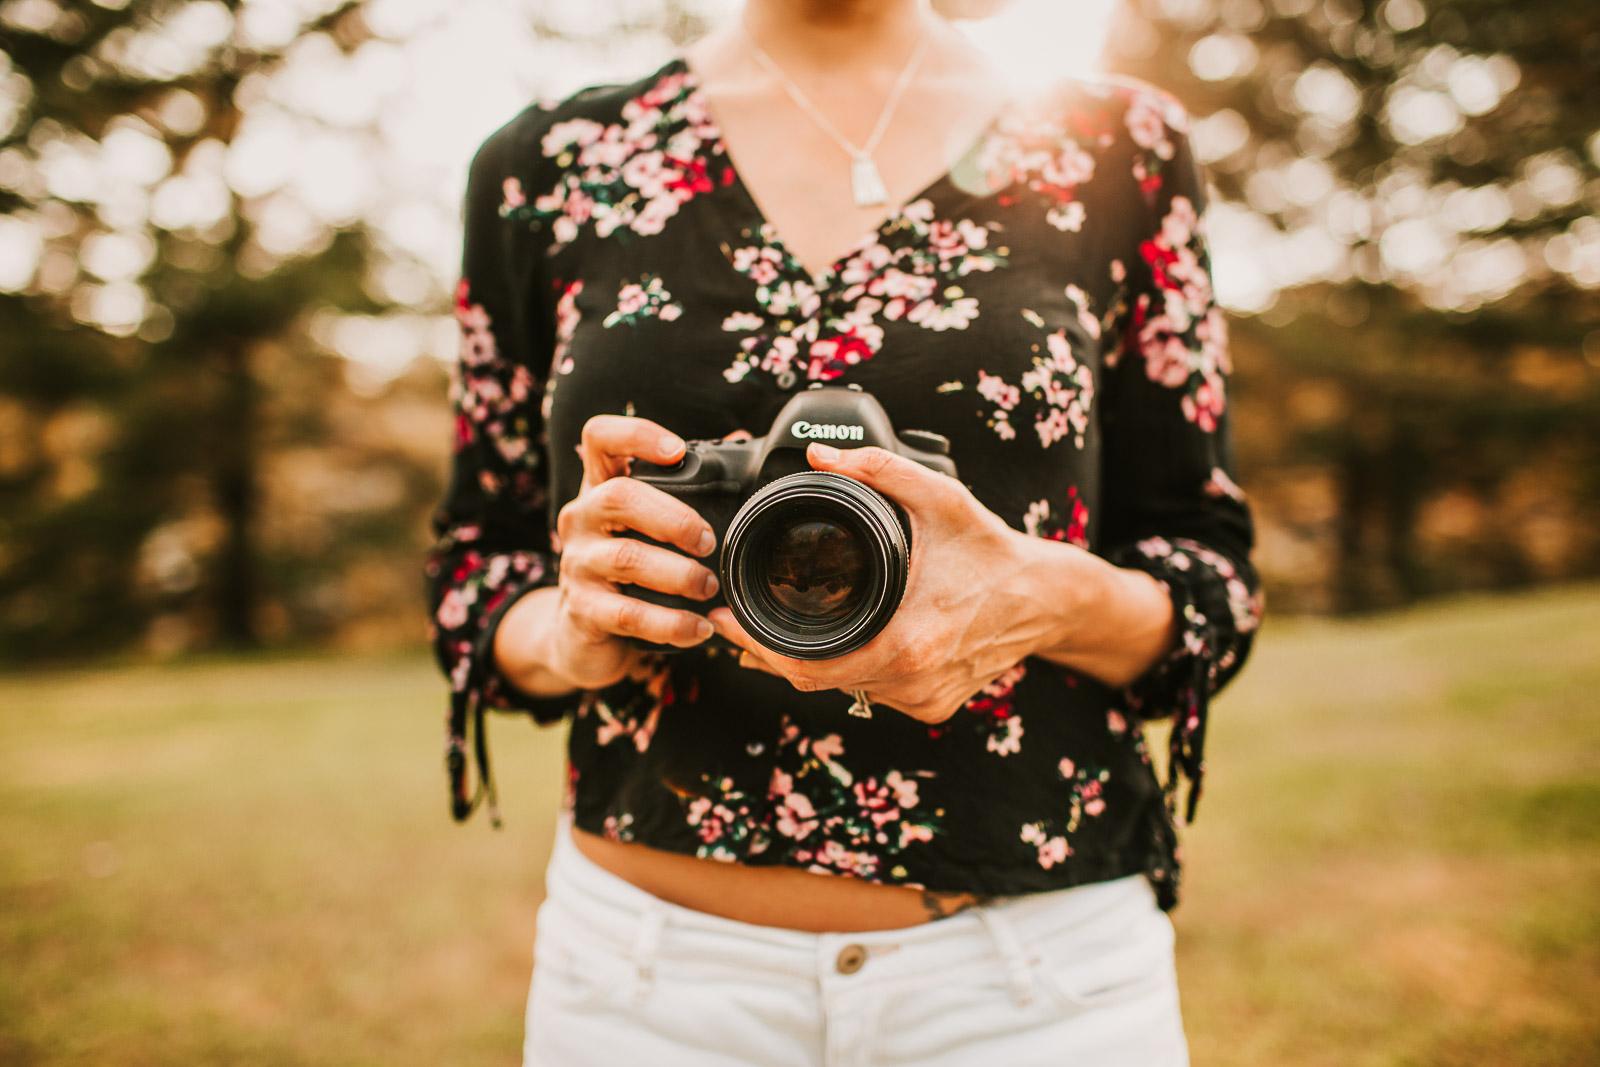 Work life balance for photographers